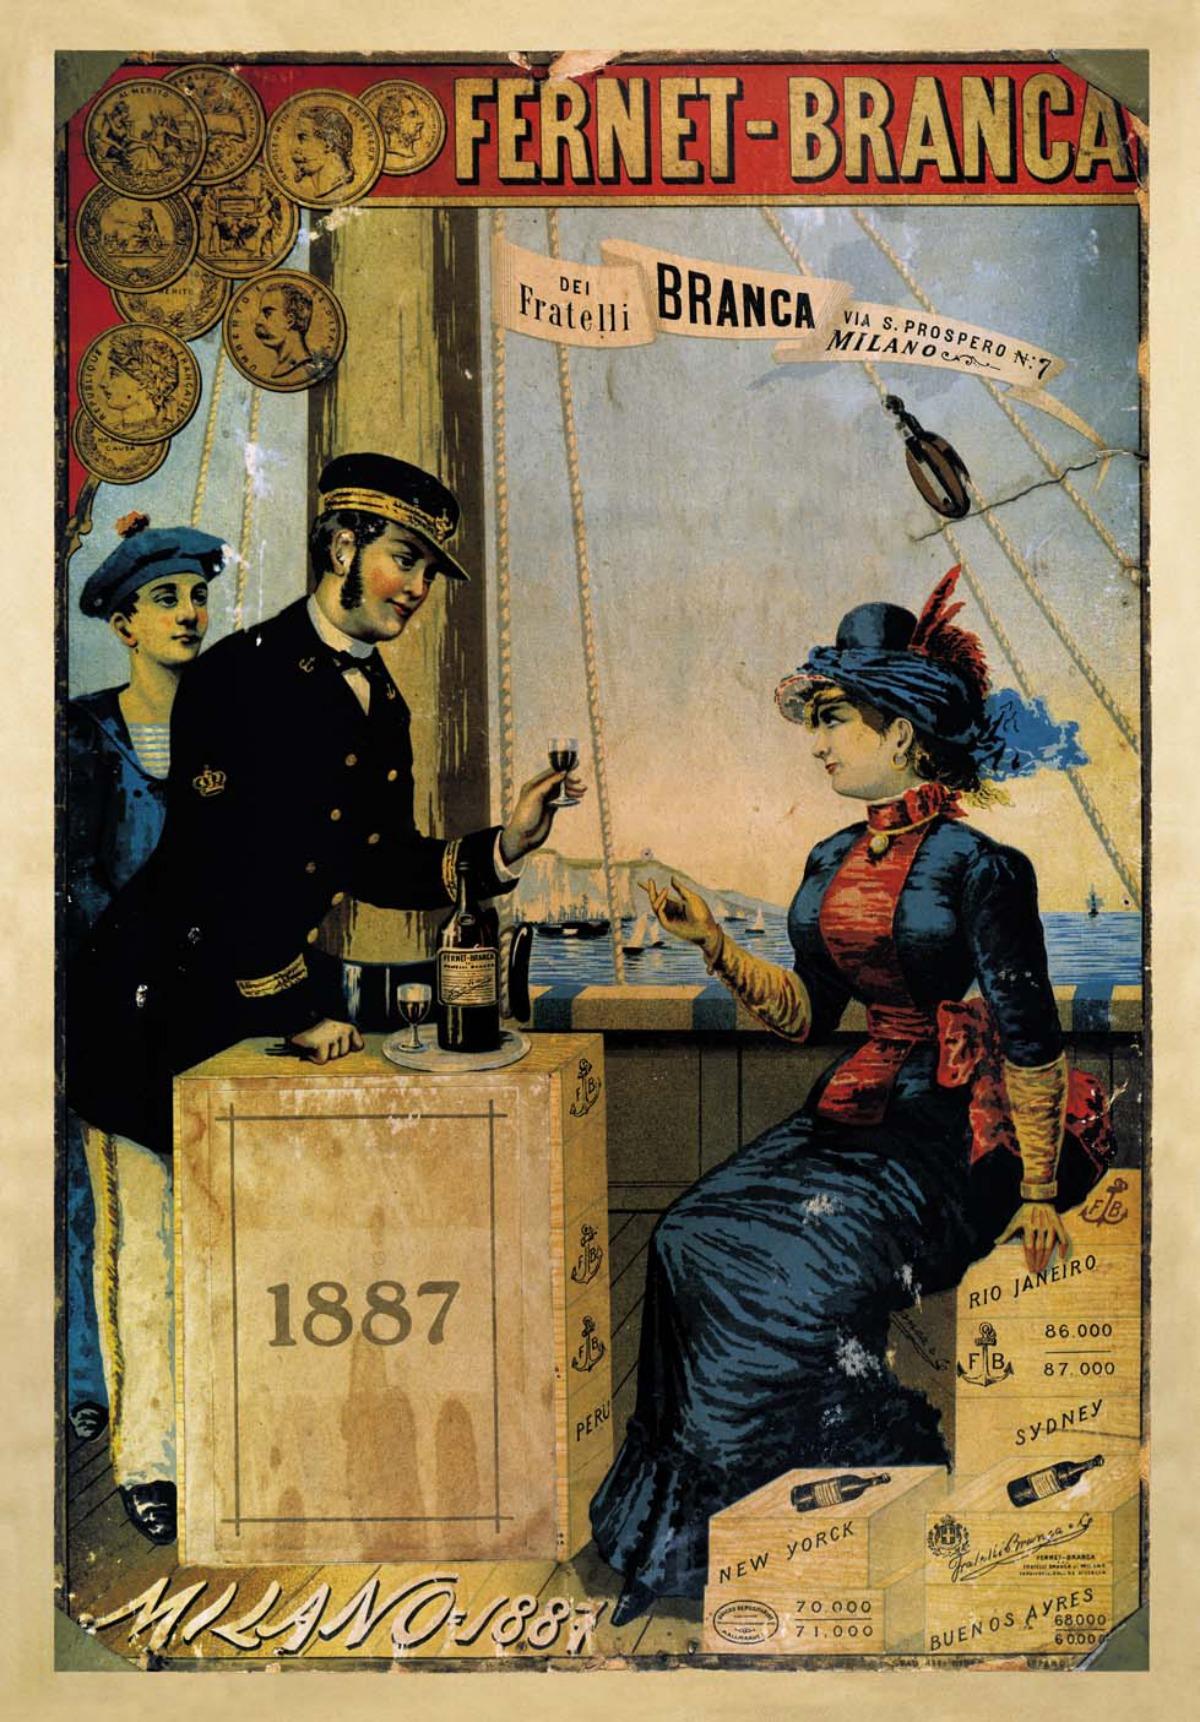 Fernet Branca 1887